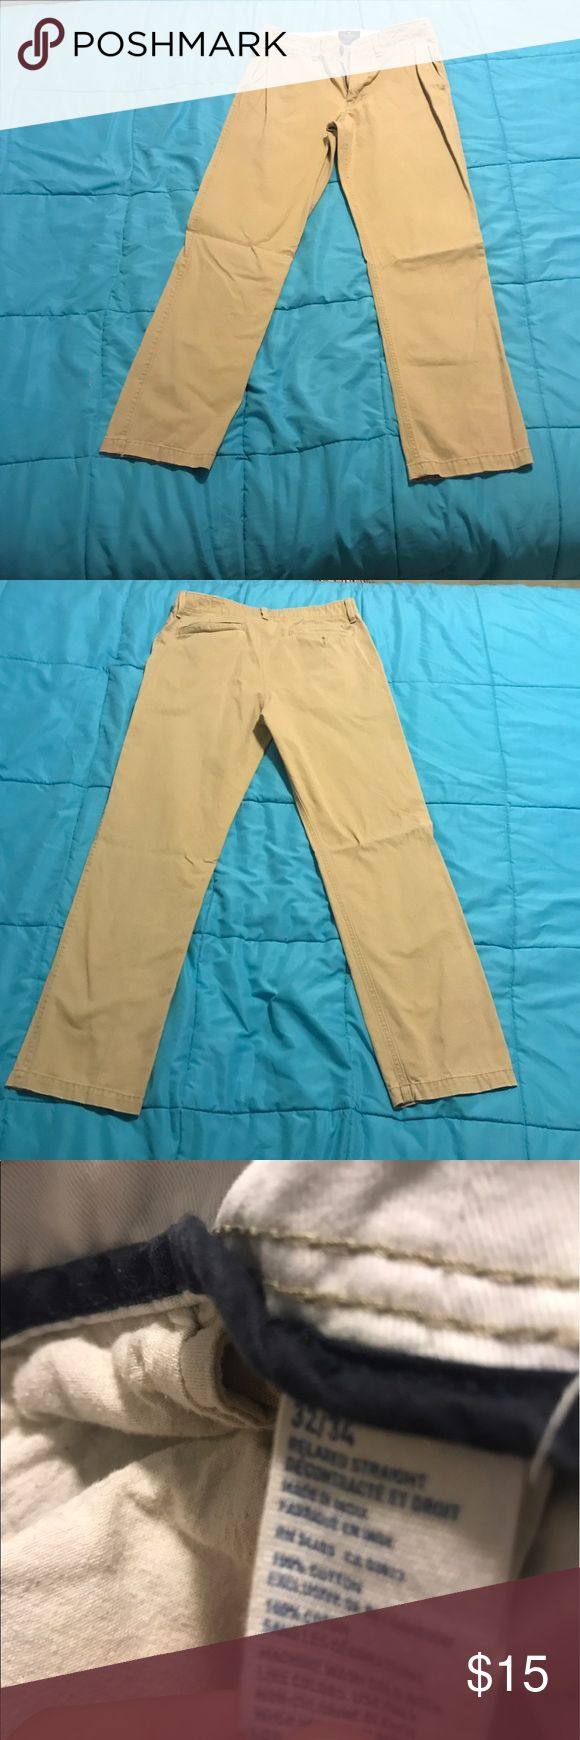 American Eagle Men's Khaki Pants. Size 32x34 American Eagle Men's Khaki Pants. Size 32 waist 34 length. Excellent condition. American Eagle Outfitters Pants Chinos & Khakis